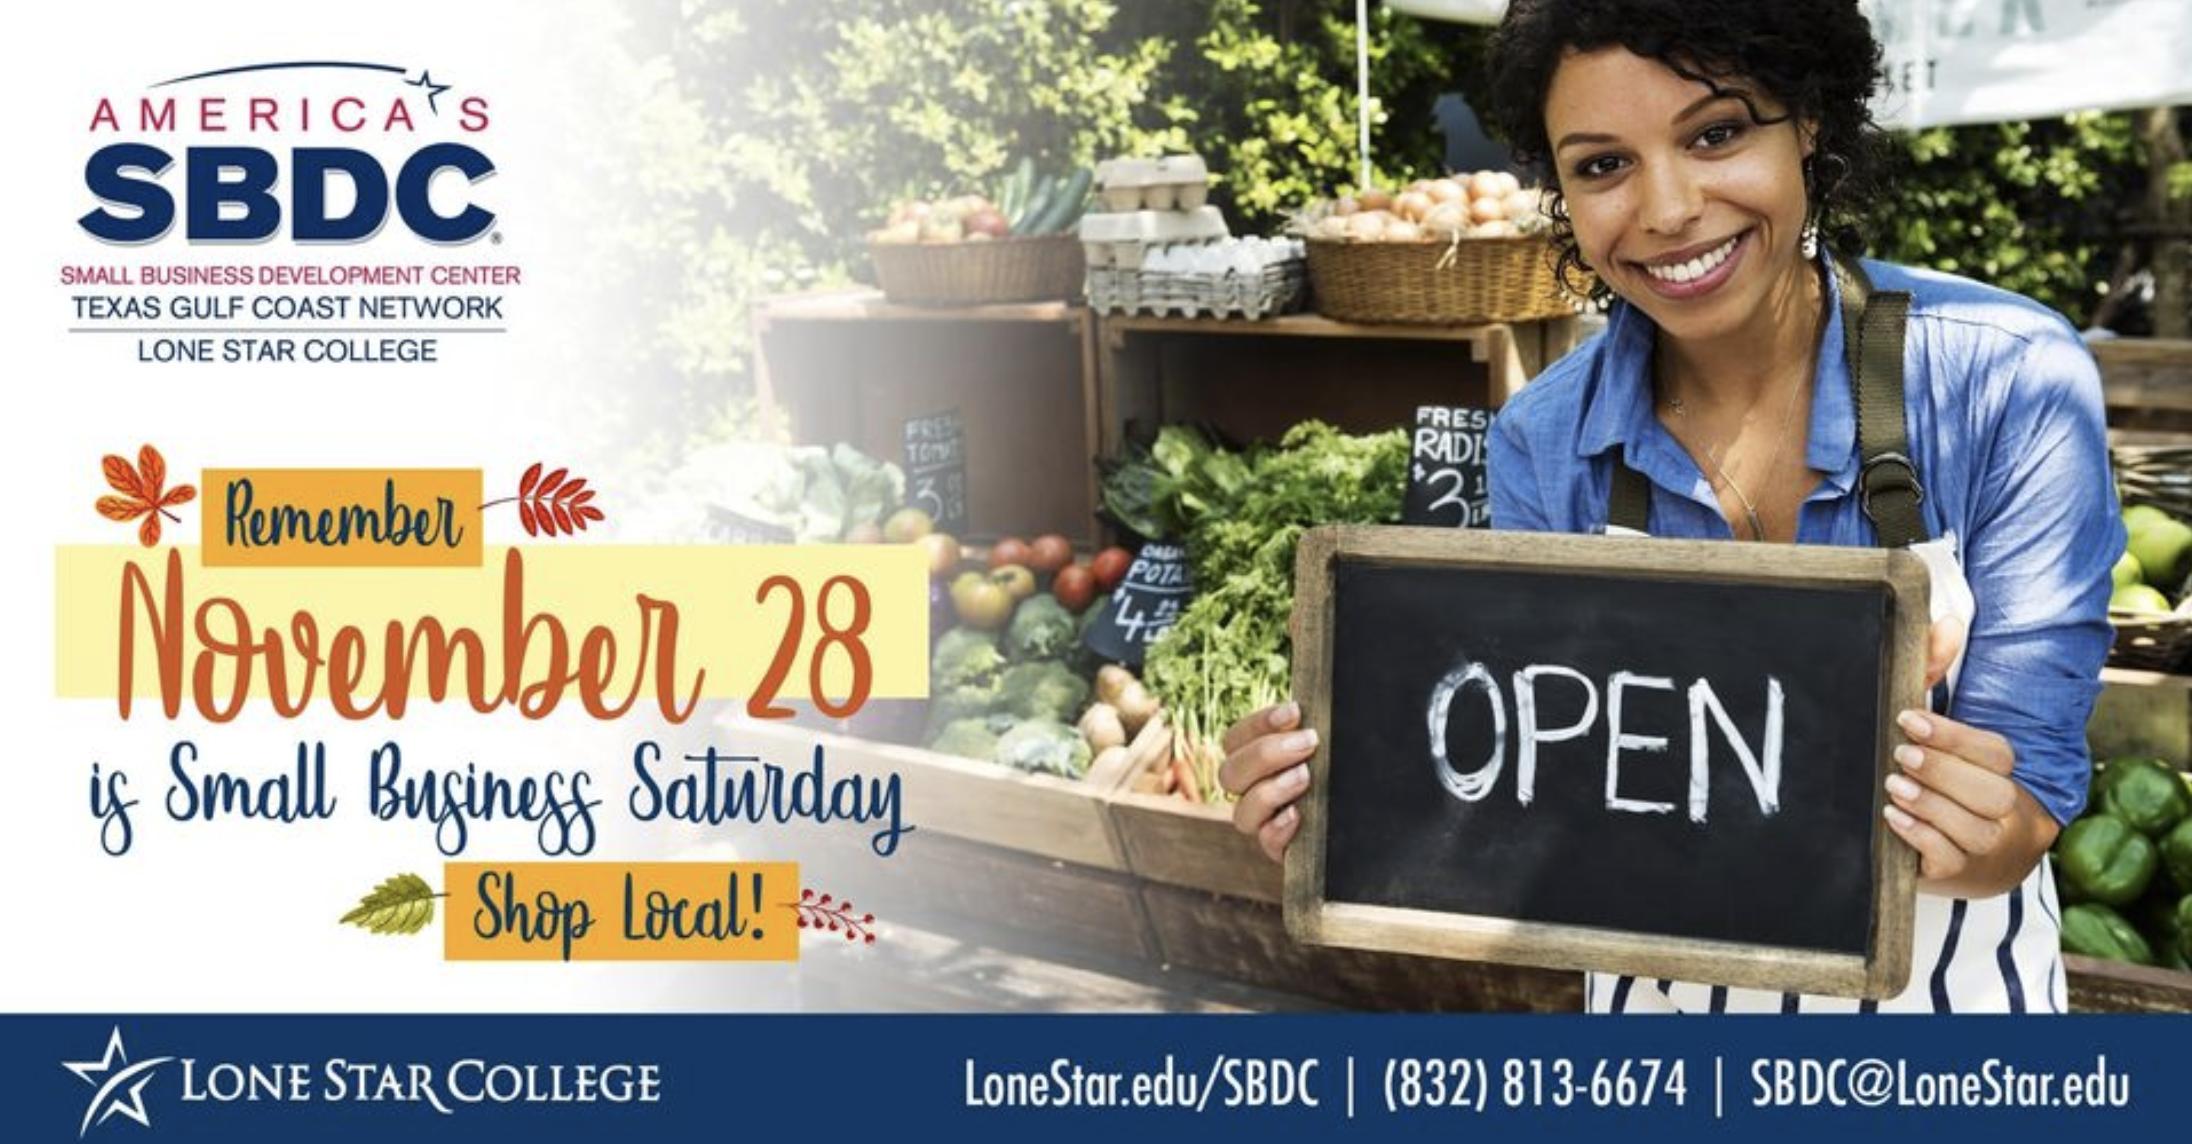 Small Business Saturday SBDC